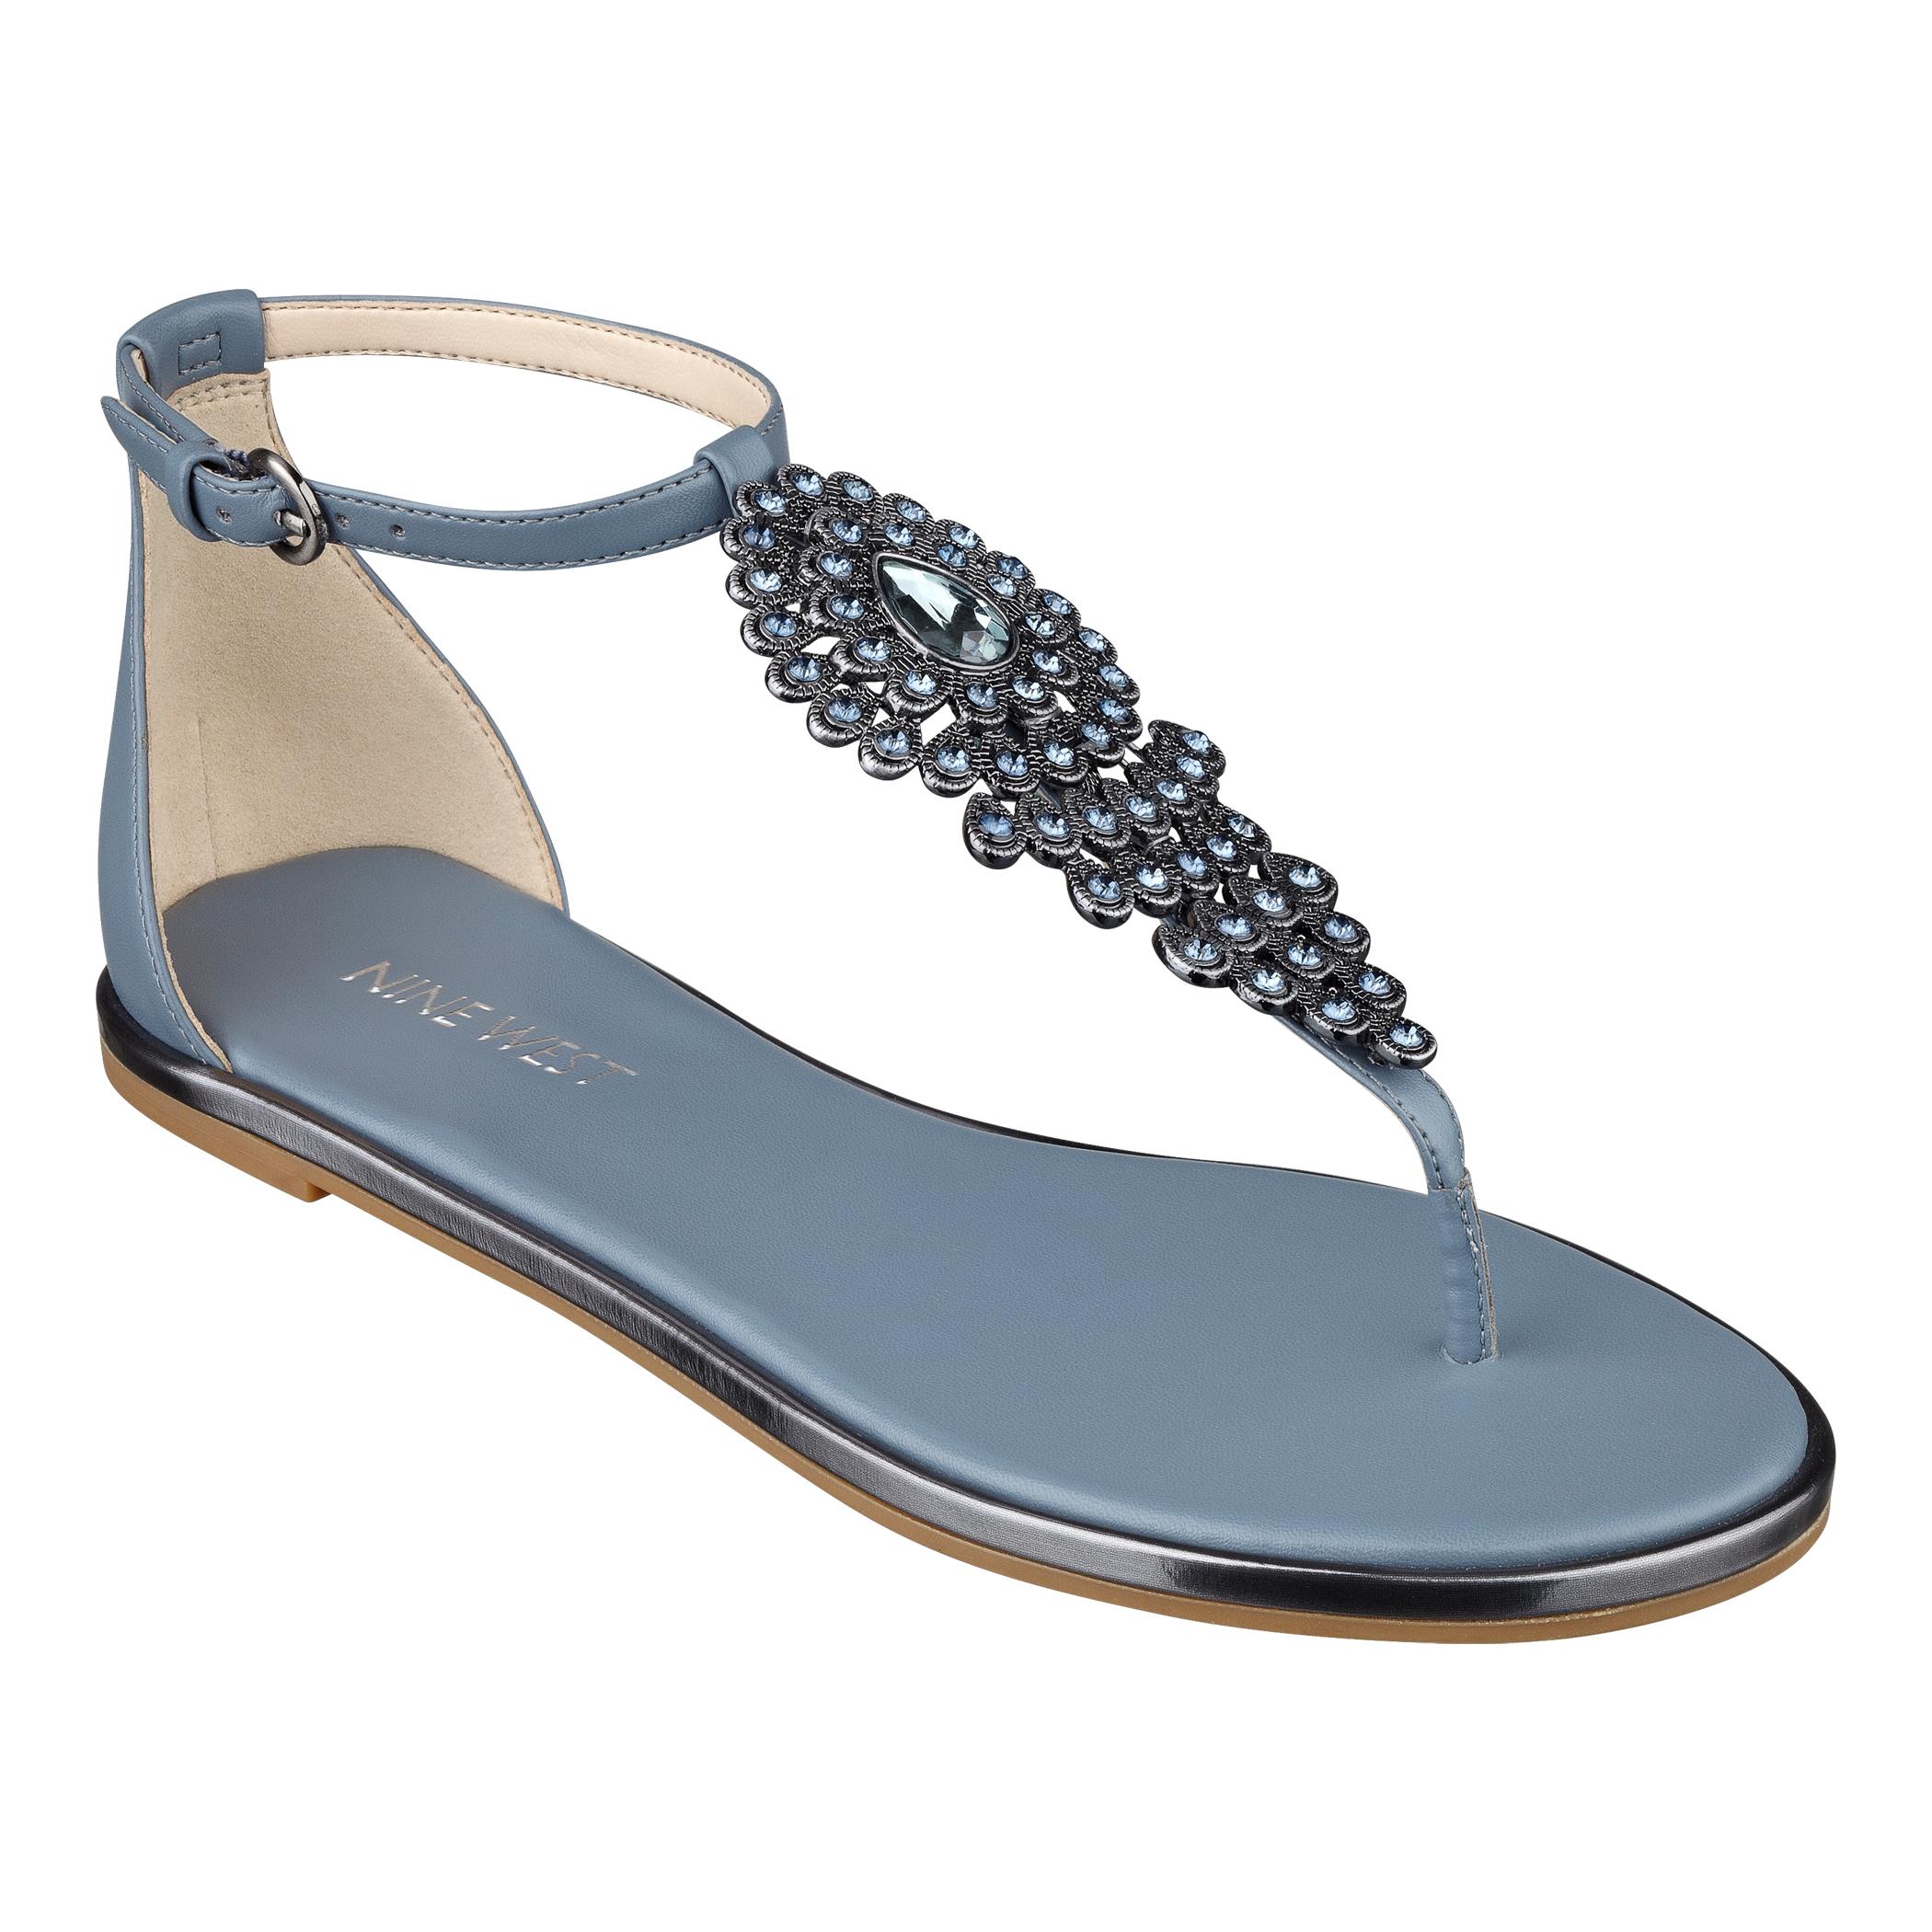 d03f4e802d3f0 Lyst - Nine West Kascada Flat Sandals in Blue